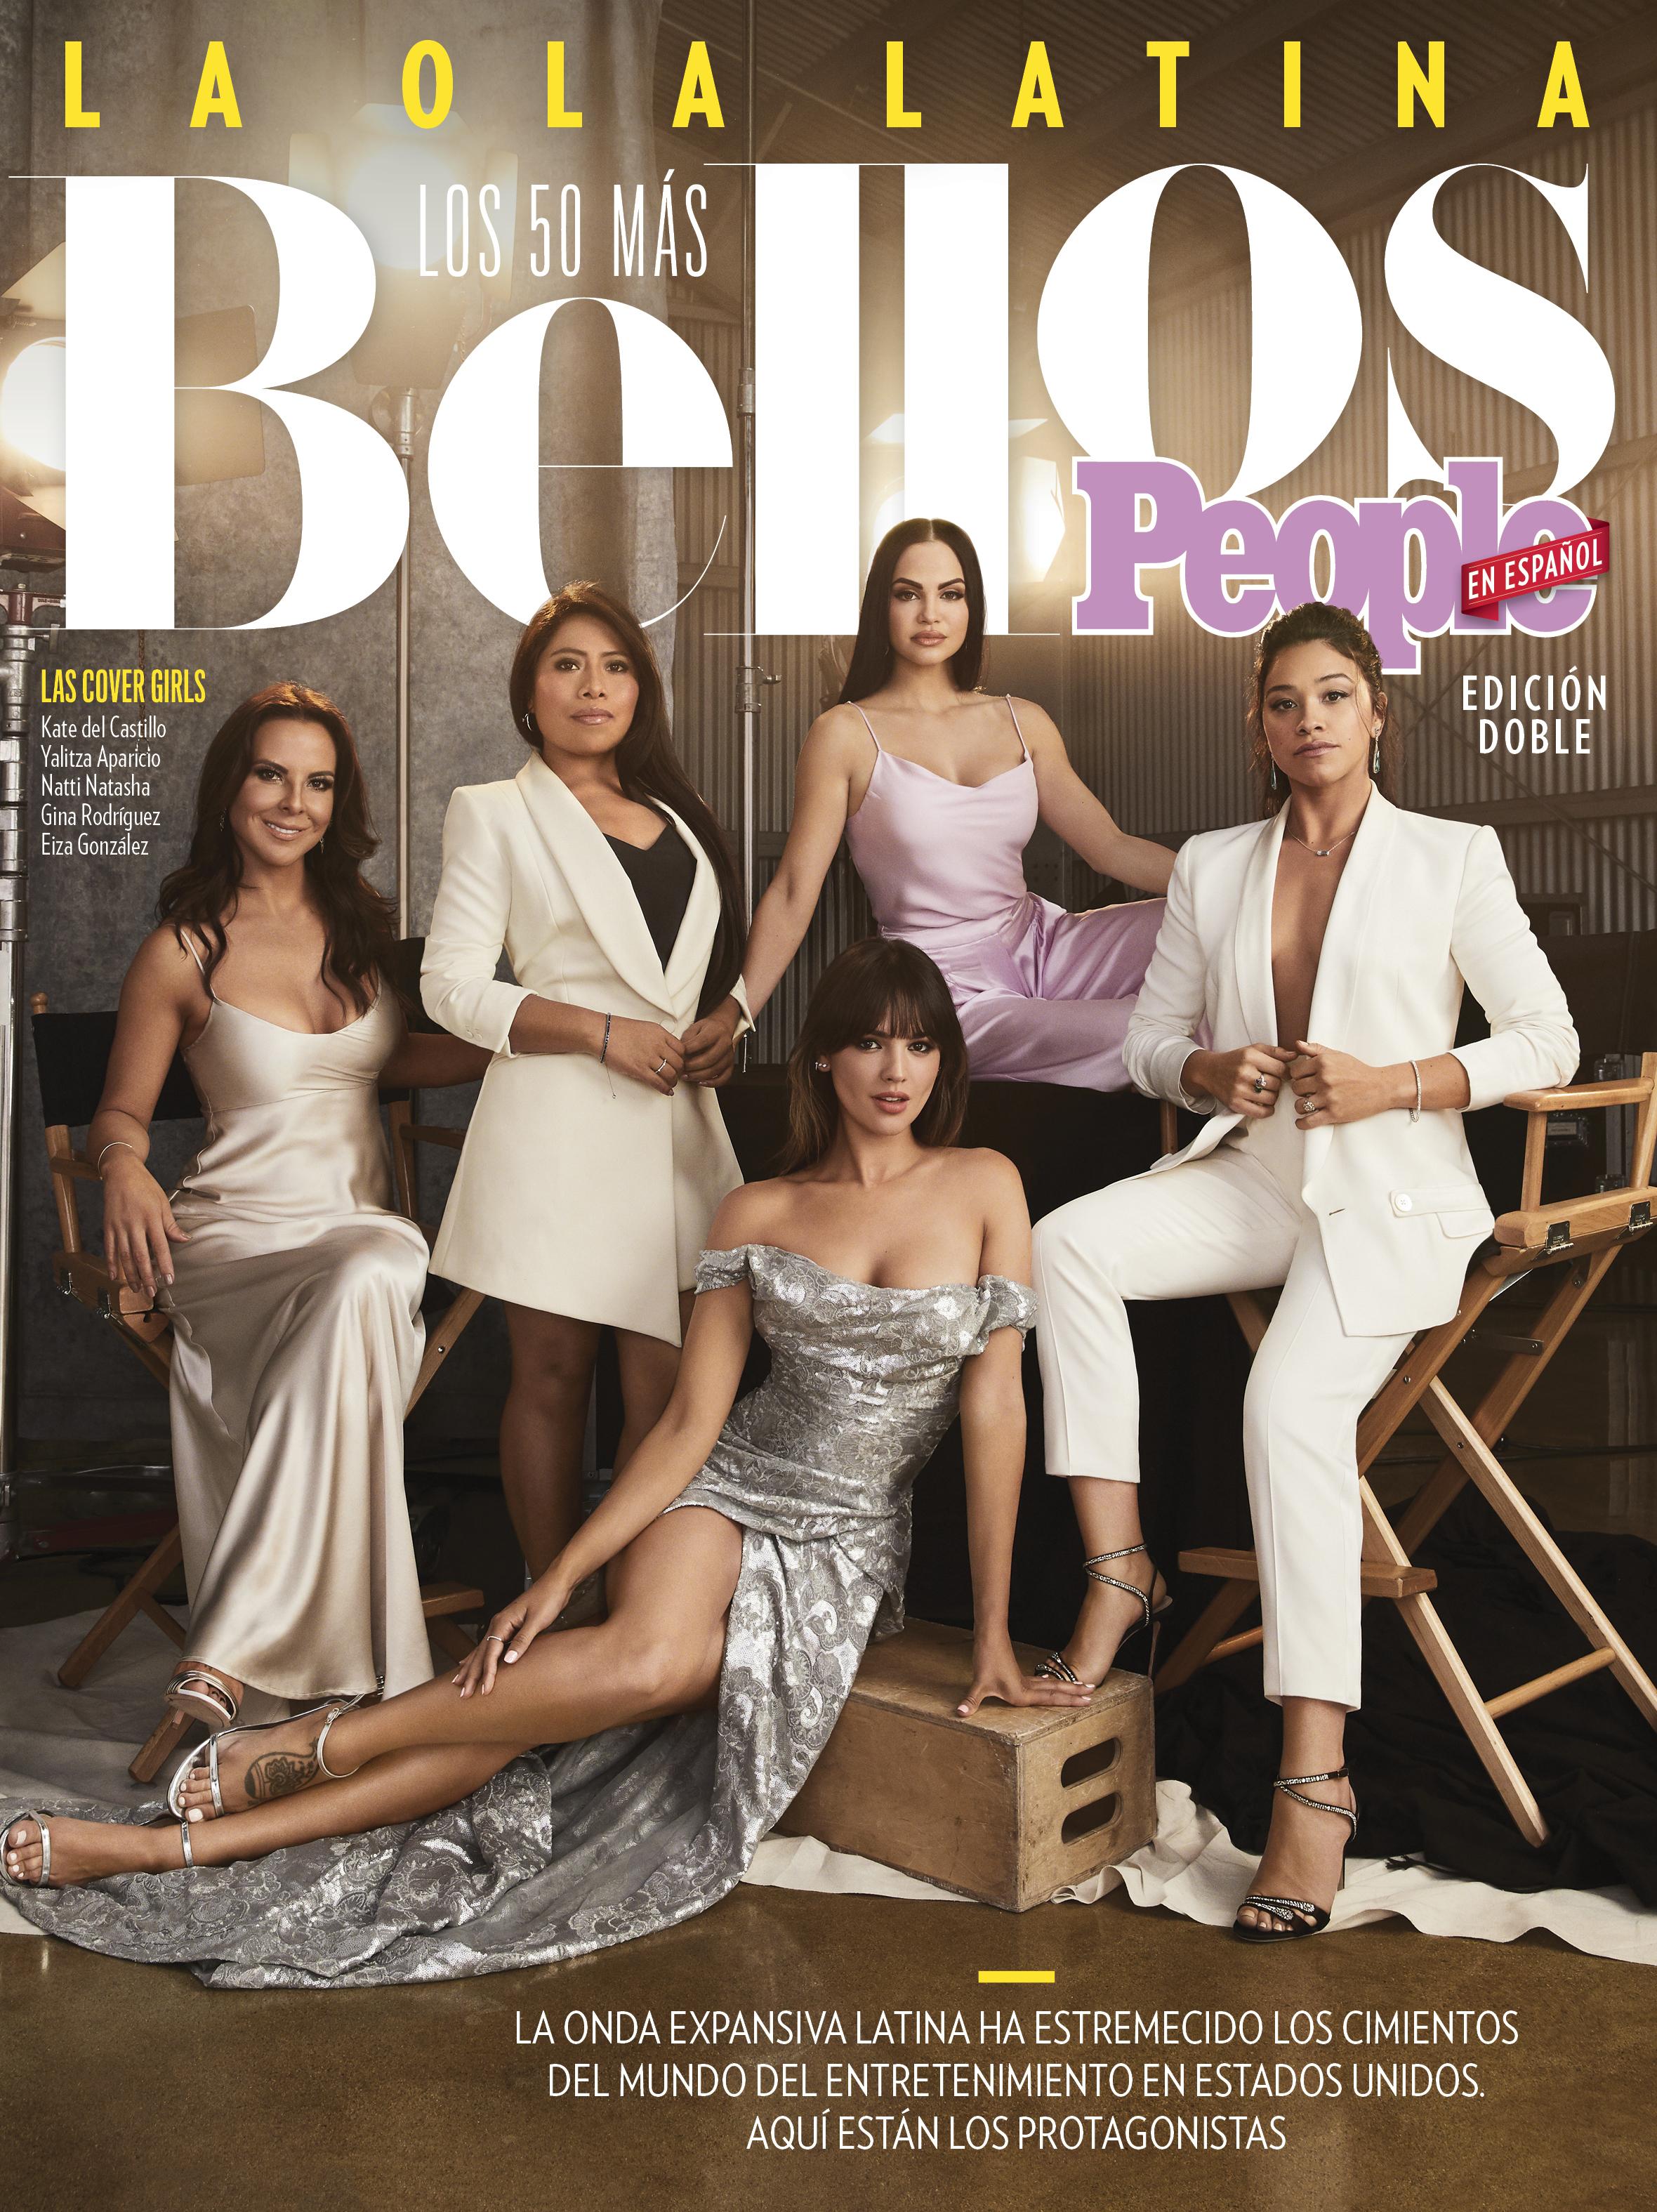 Bellos 2019 cover